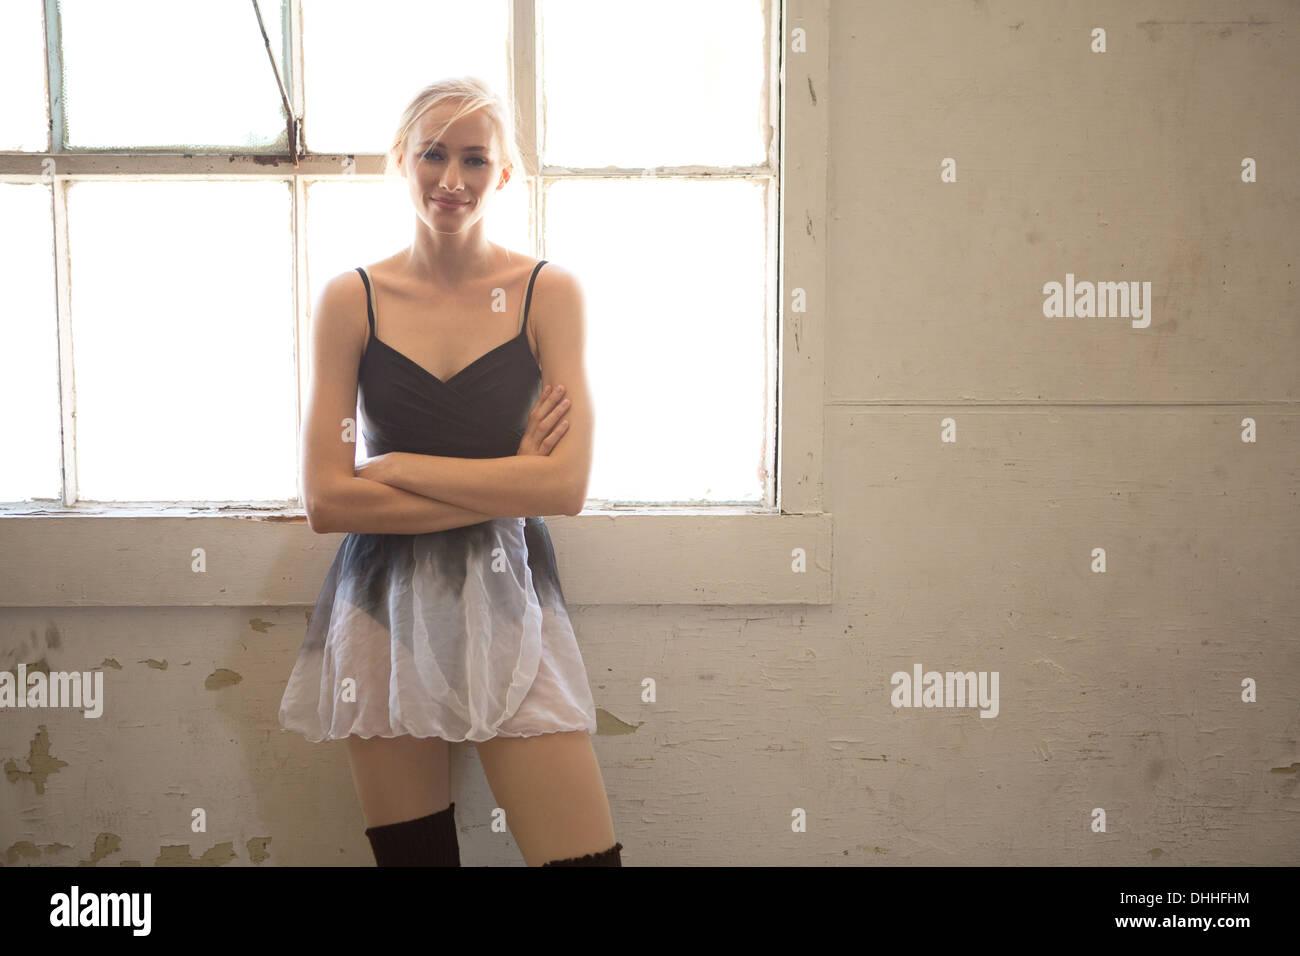 Porträt von Ballett-Tänzerin mit verschränkten Armen Stockbild